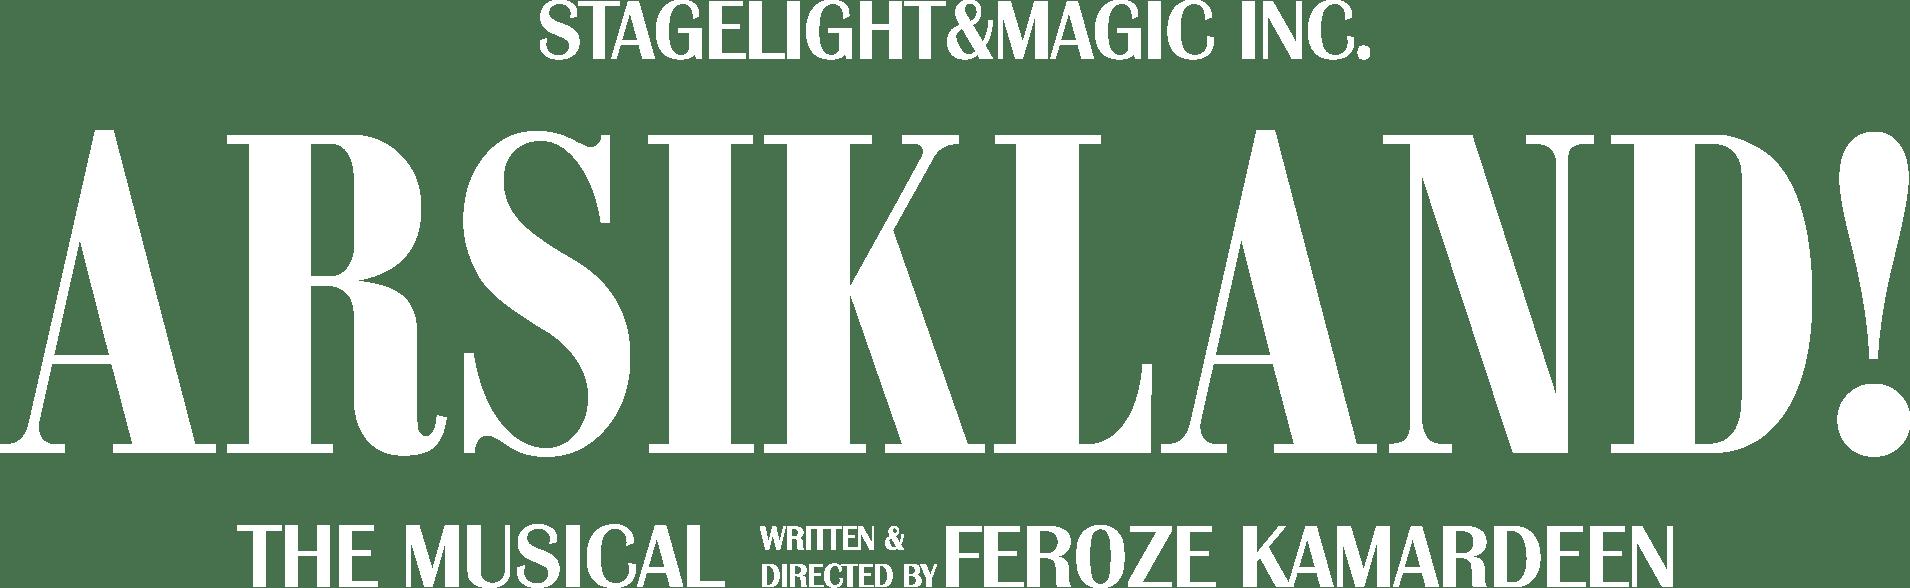 Arsikland Logo White